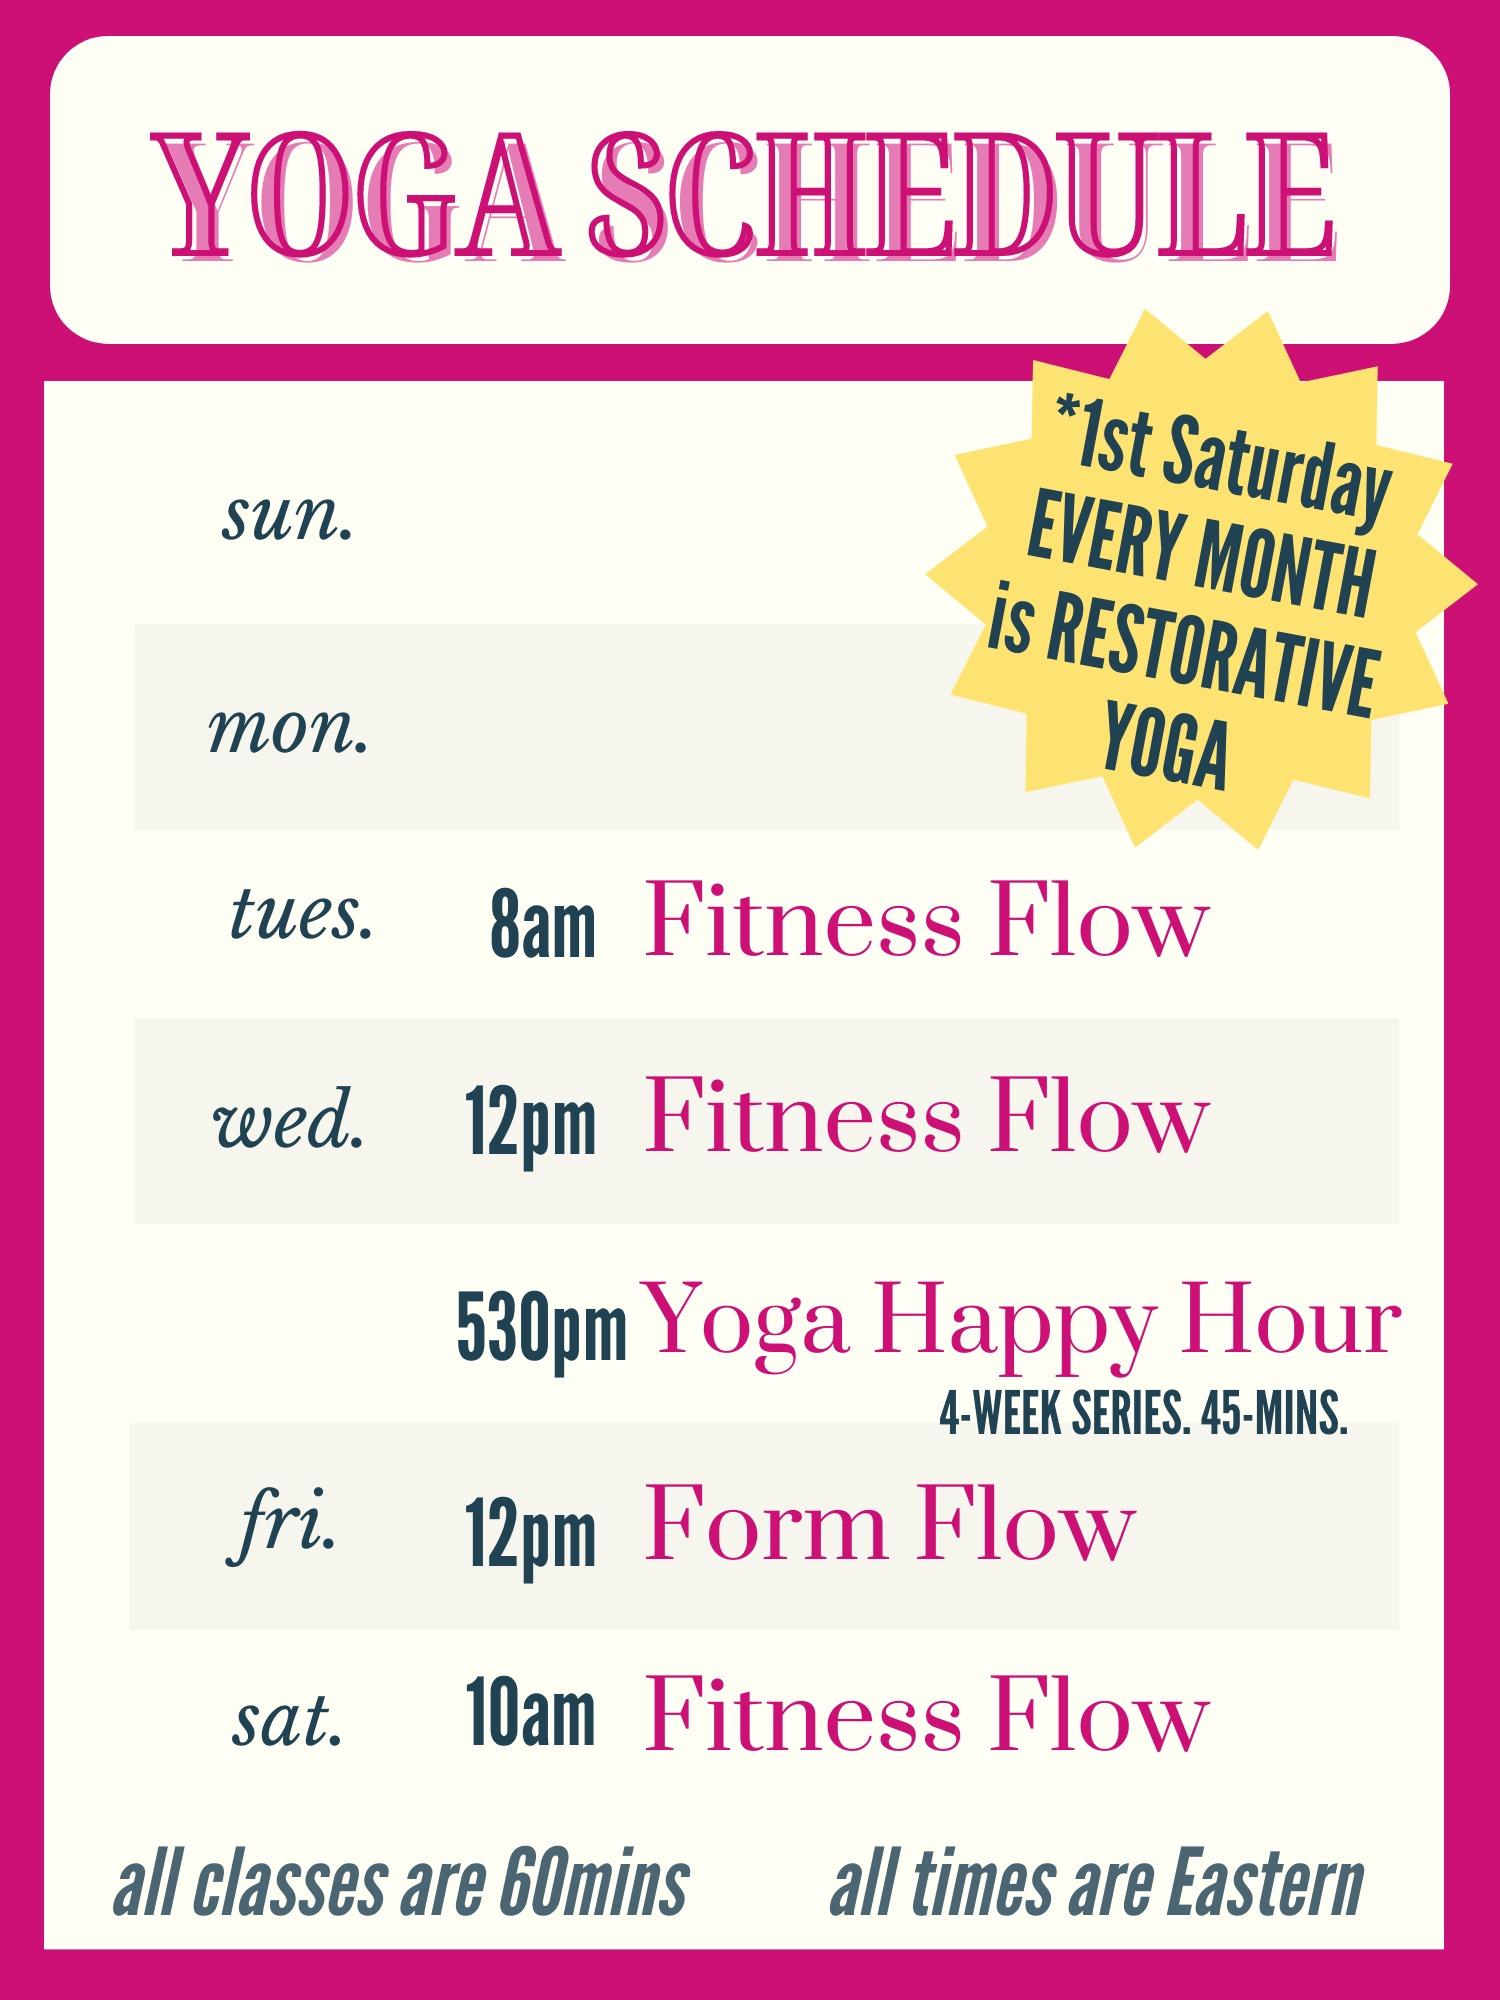 Rebecca Bly Glow Yoga Club Schedule rebeccably.com